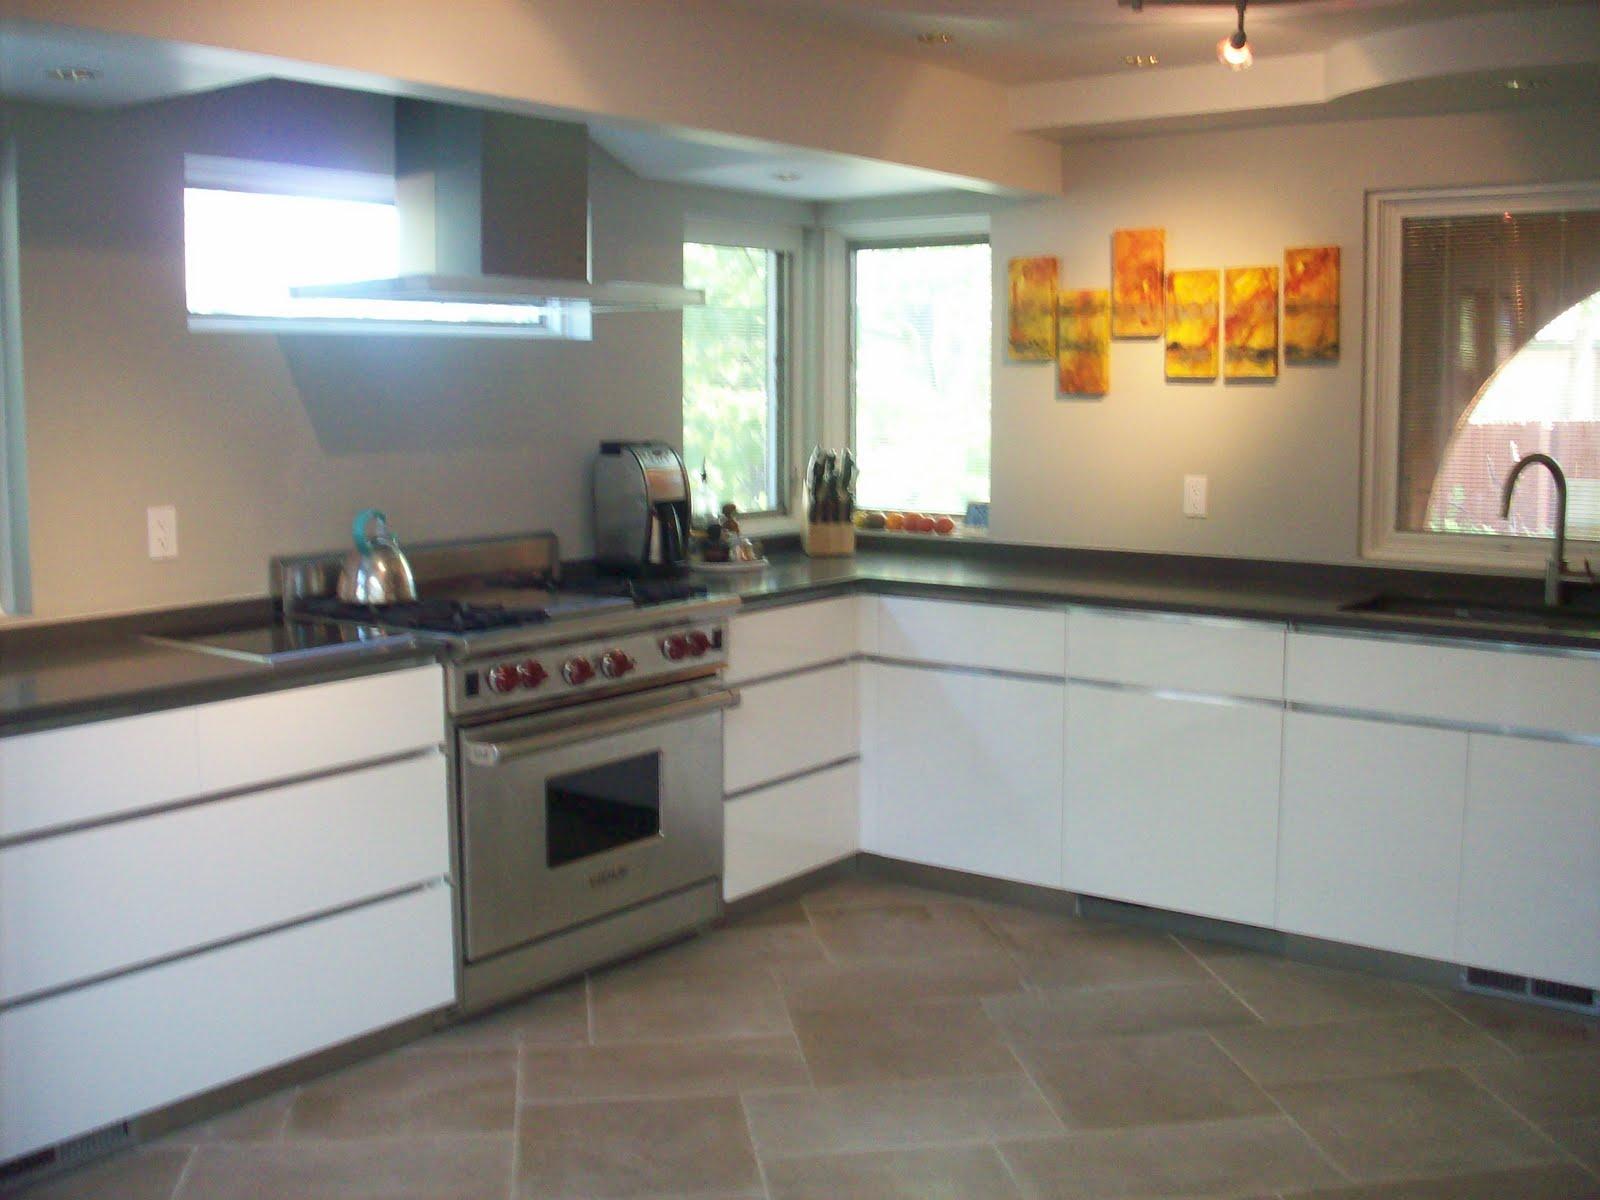 C Channel Kitchen Cabinets